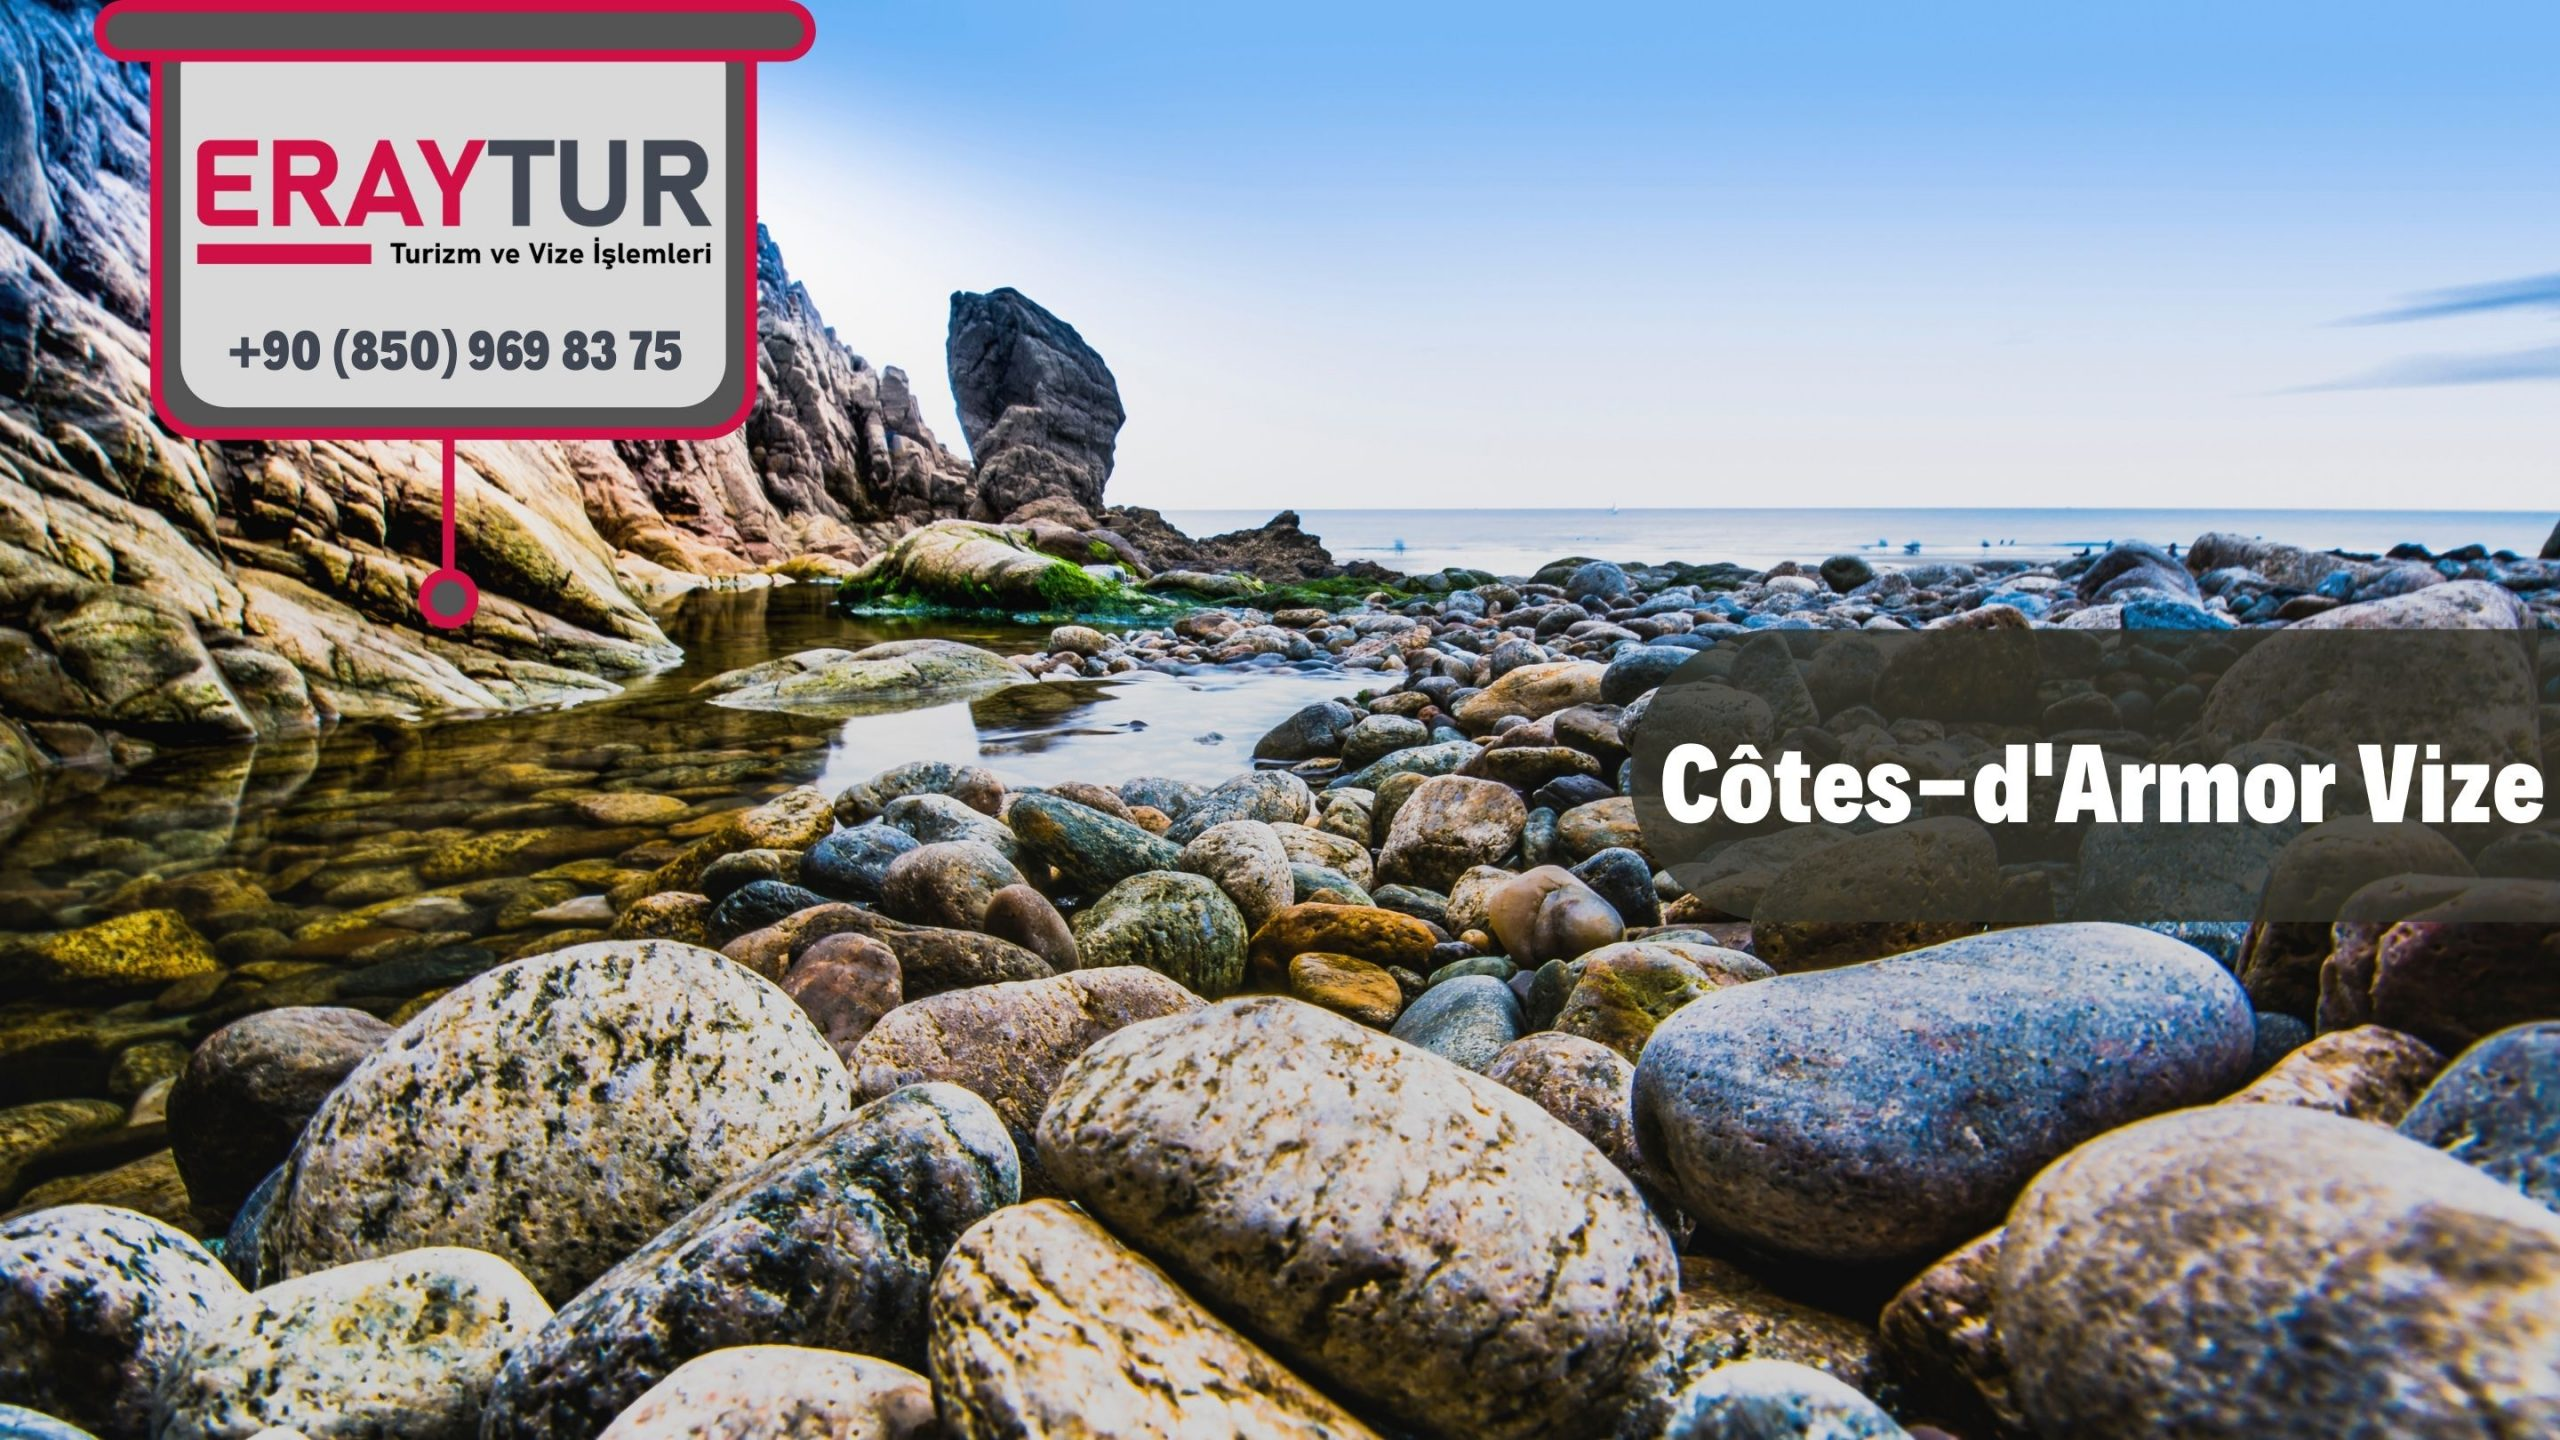 Fransa Cotes- d'Armor Vize Başvurusu